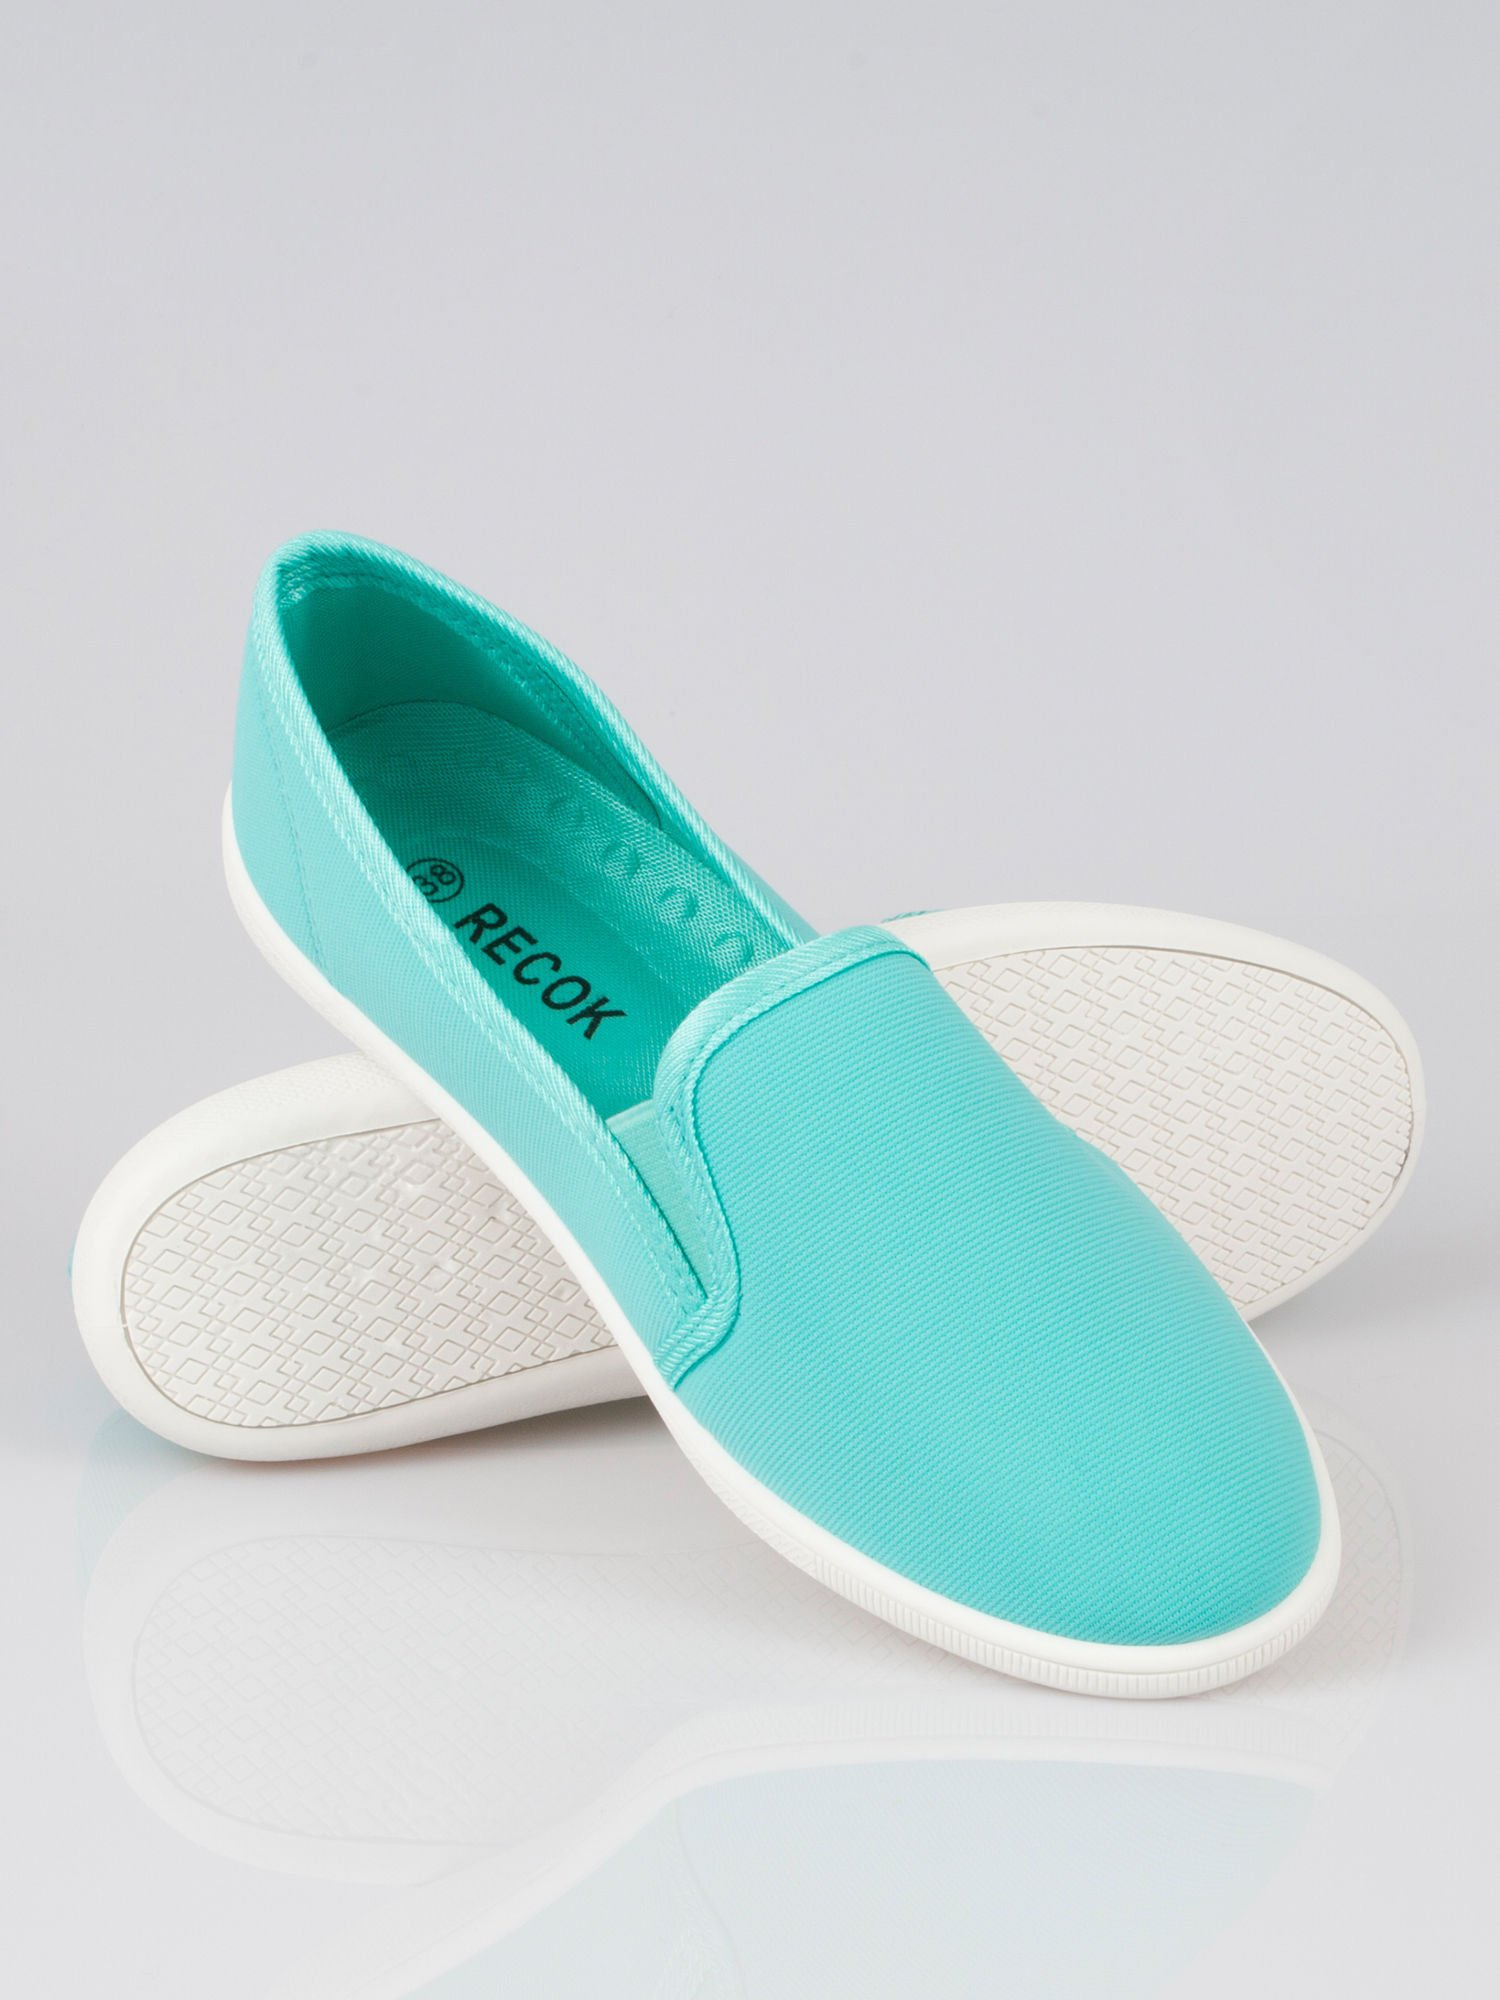 Zielone lekkie buty sliponki                                  zdj.                                  1